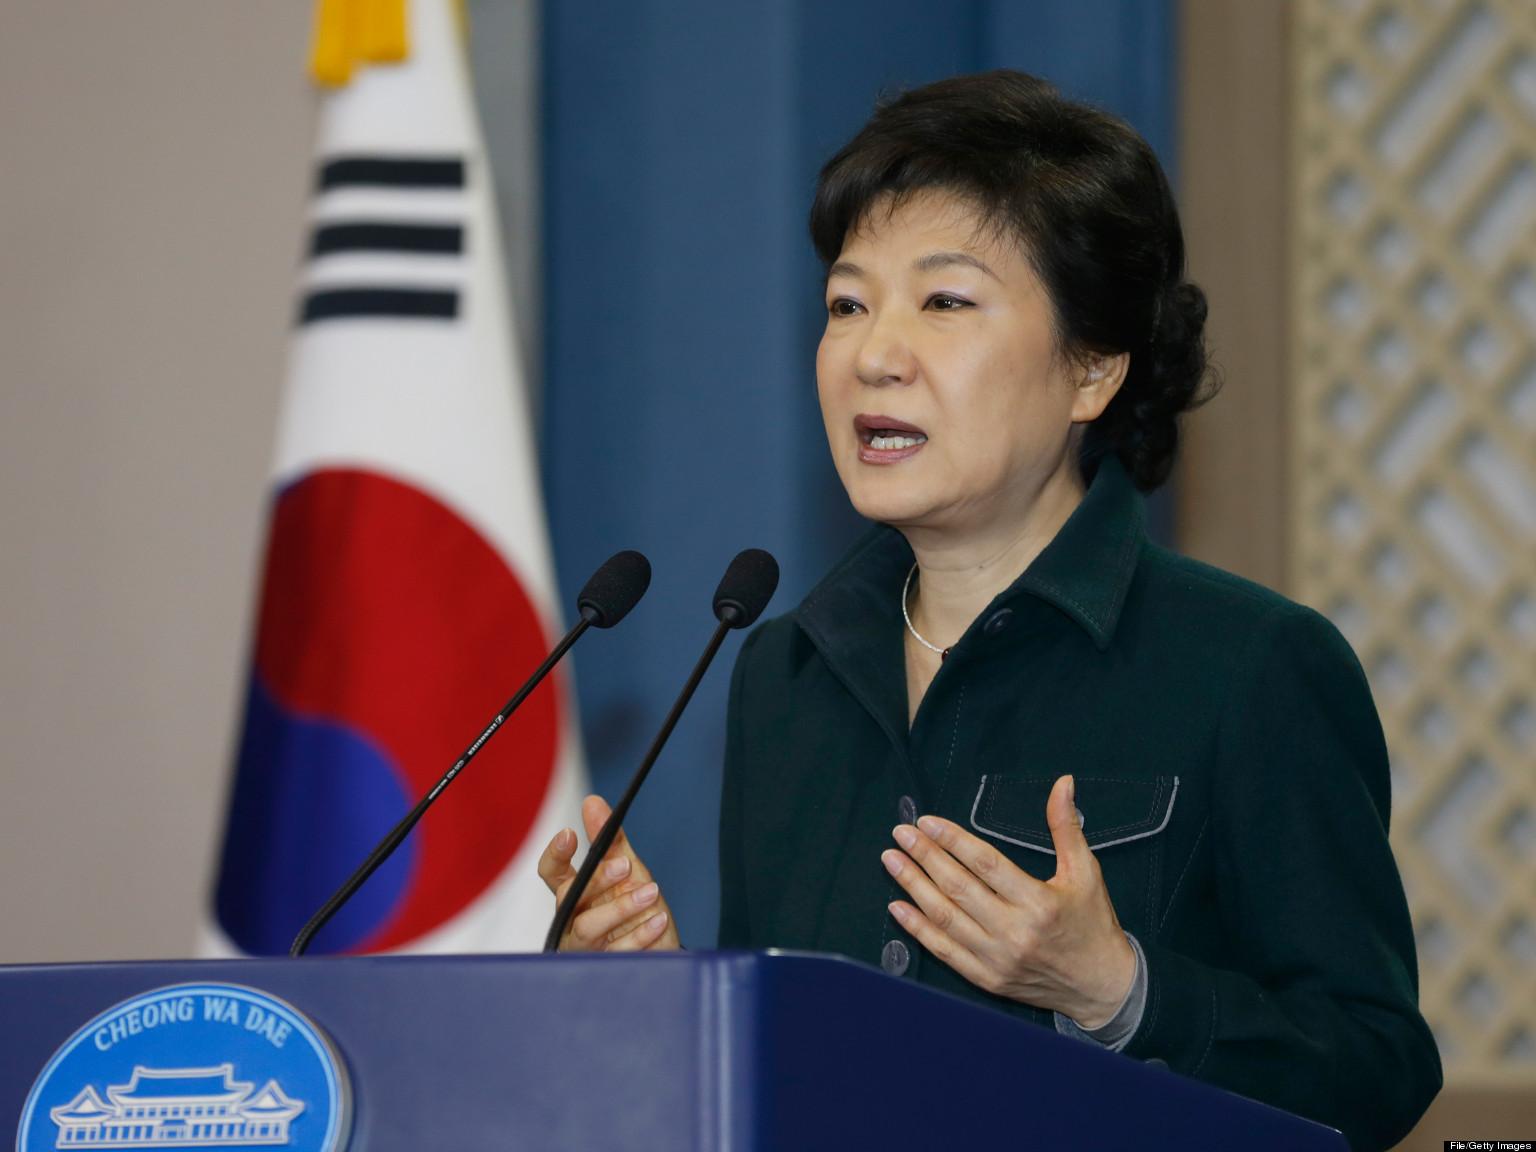 I Am Sorry: Ousted Korean Leader Park Geun-Hye